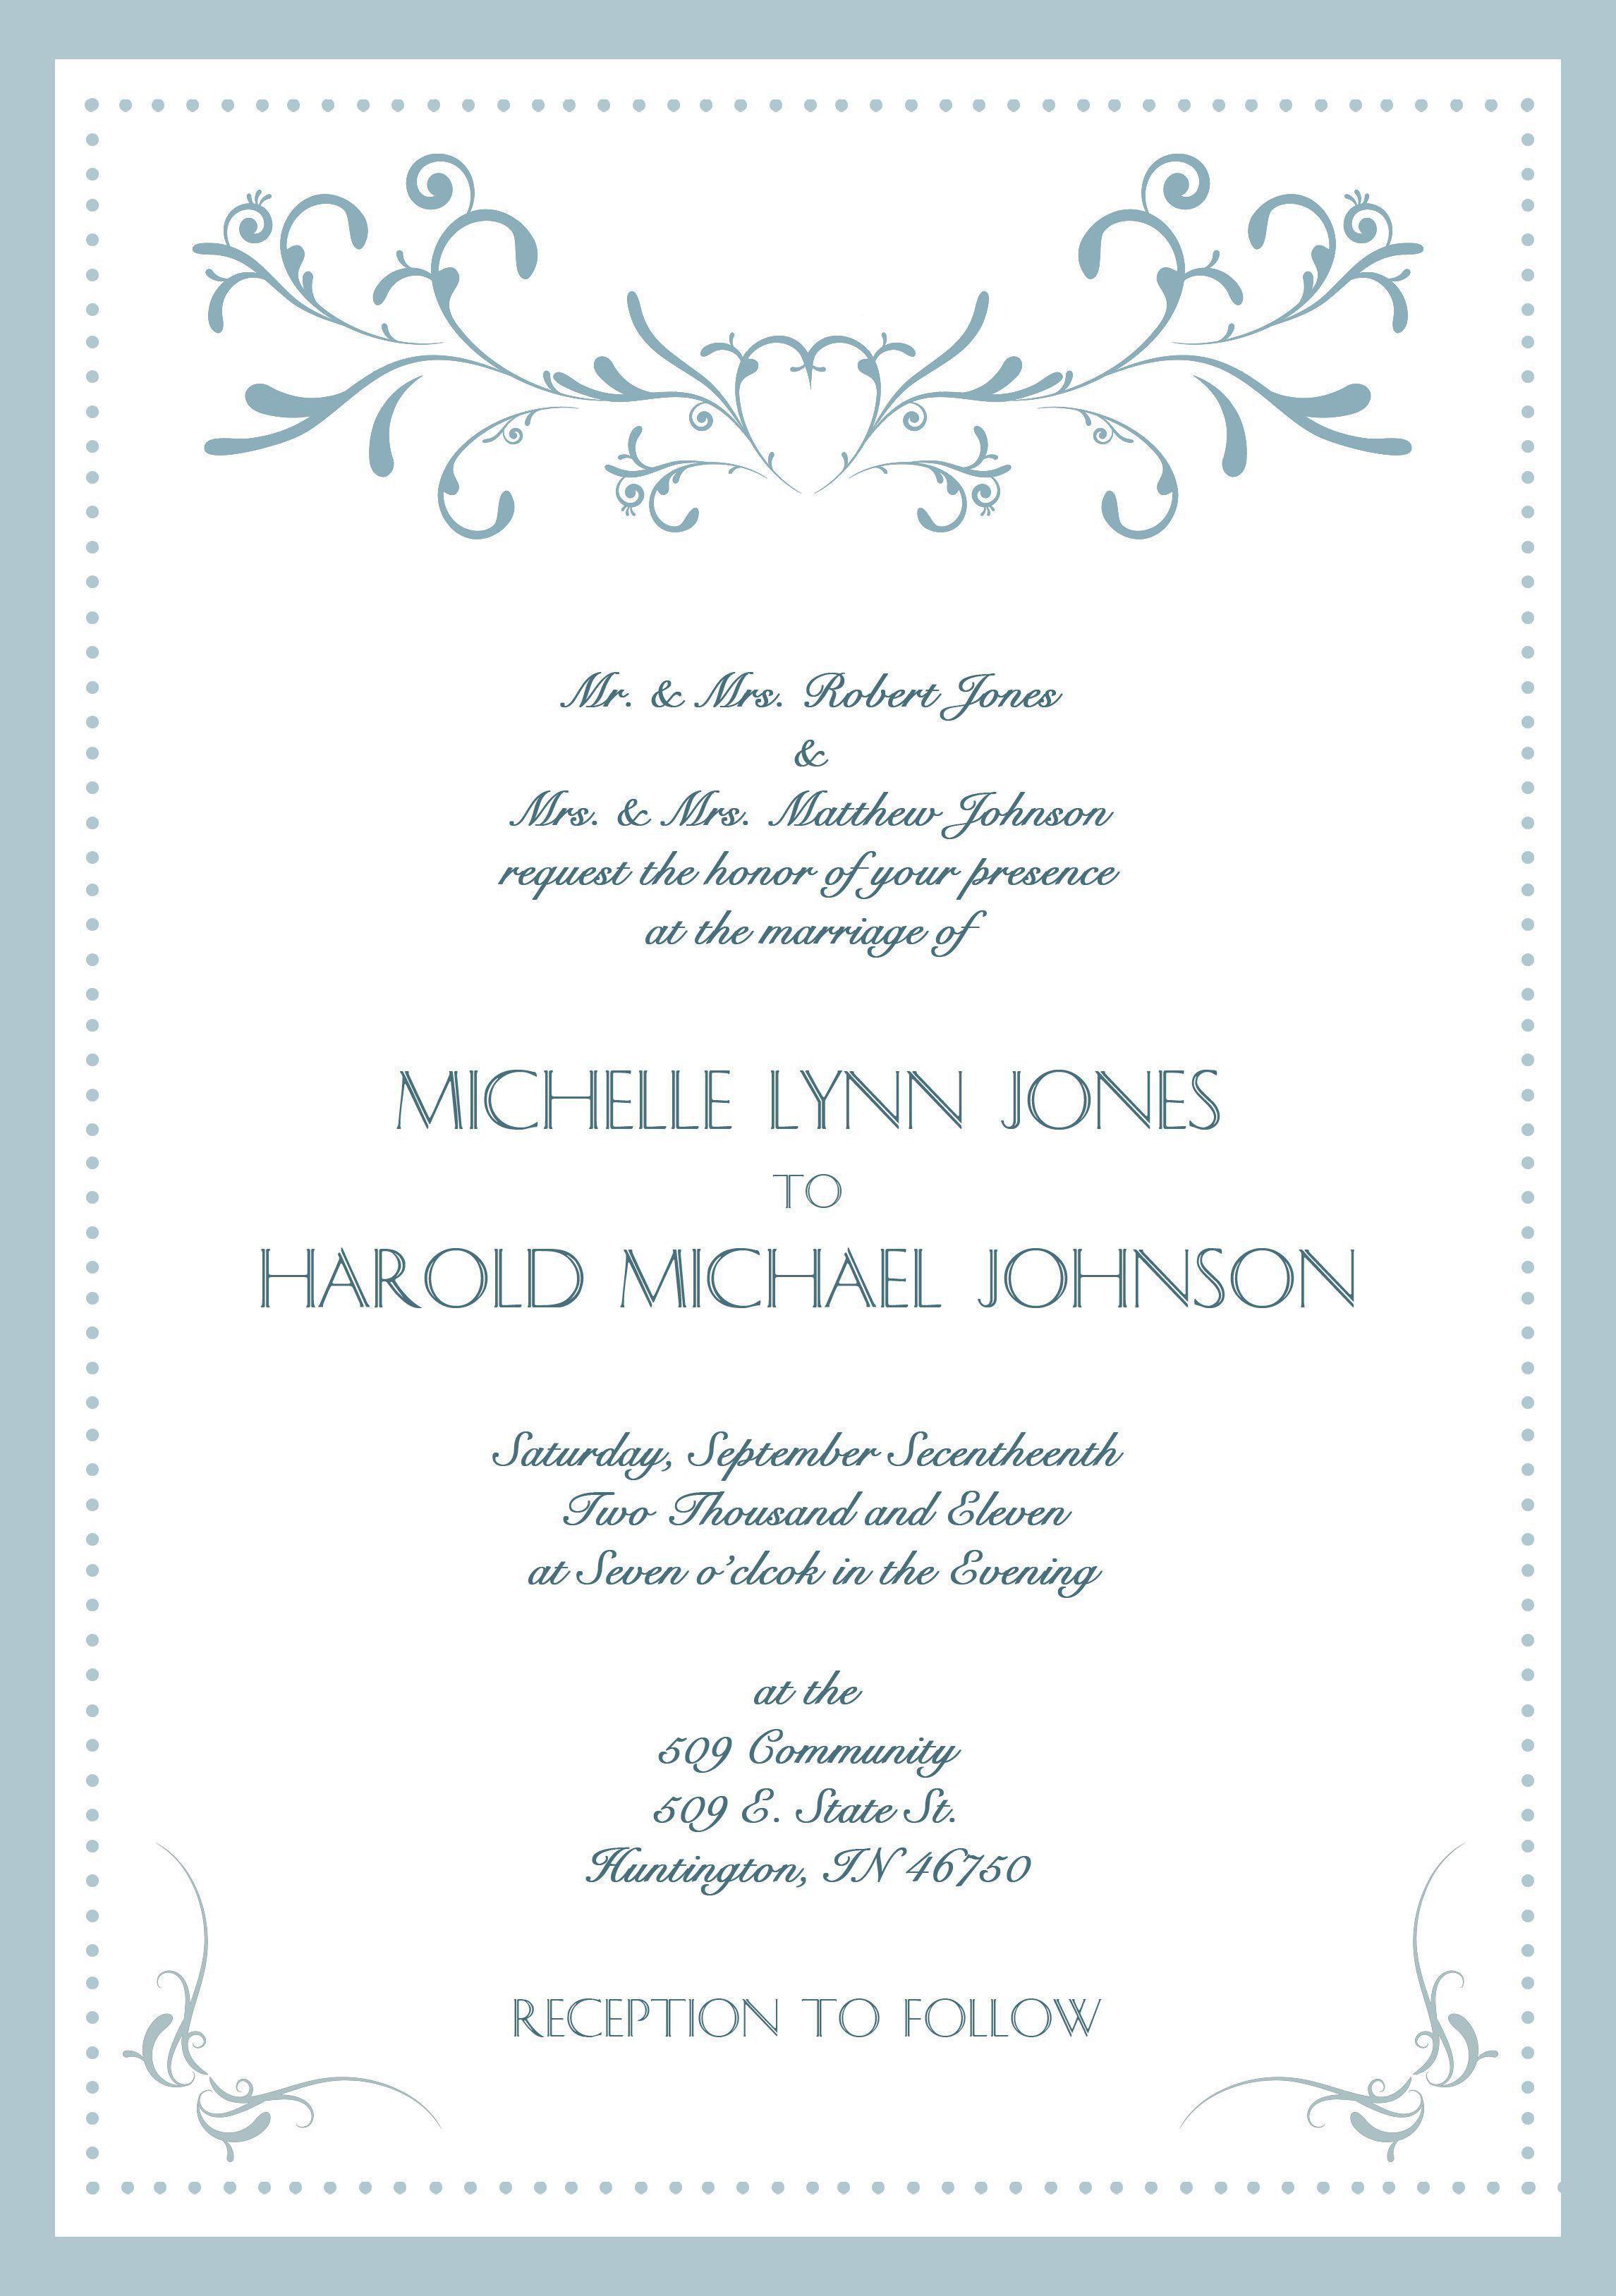 Contoh Formal Invitation : contoh, formal, invitation, Contoh, Formal, Invitation, Wedding, Materi, Pelajaran